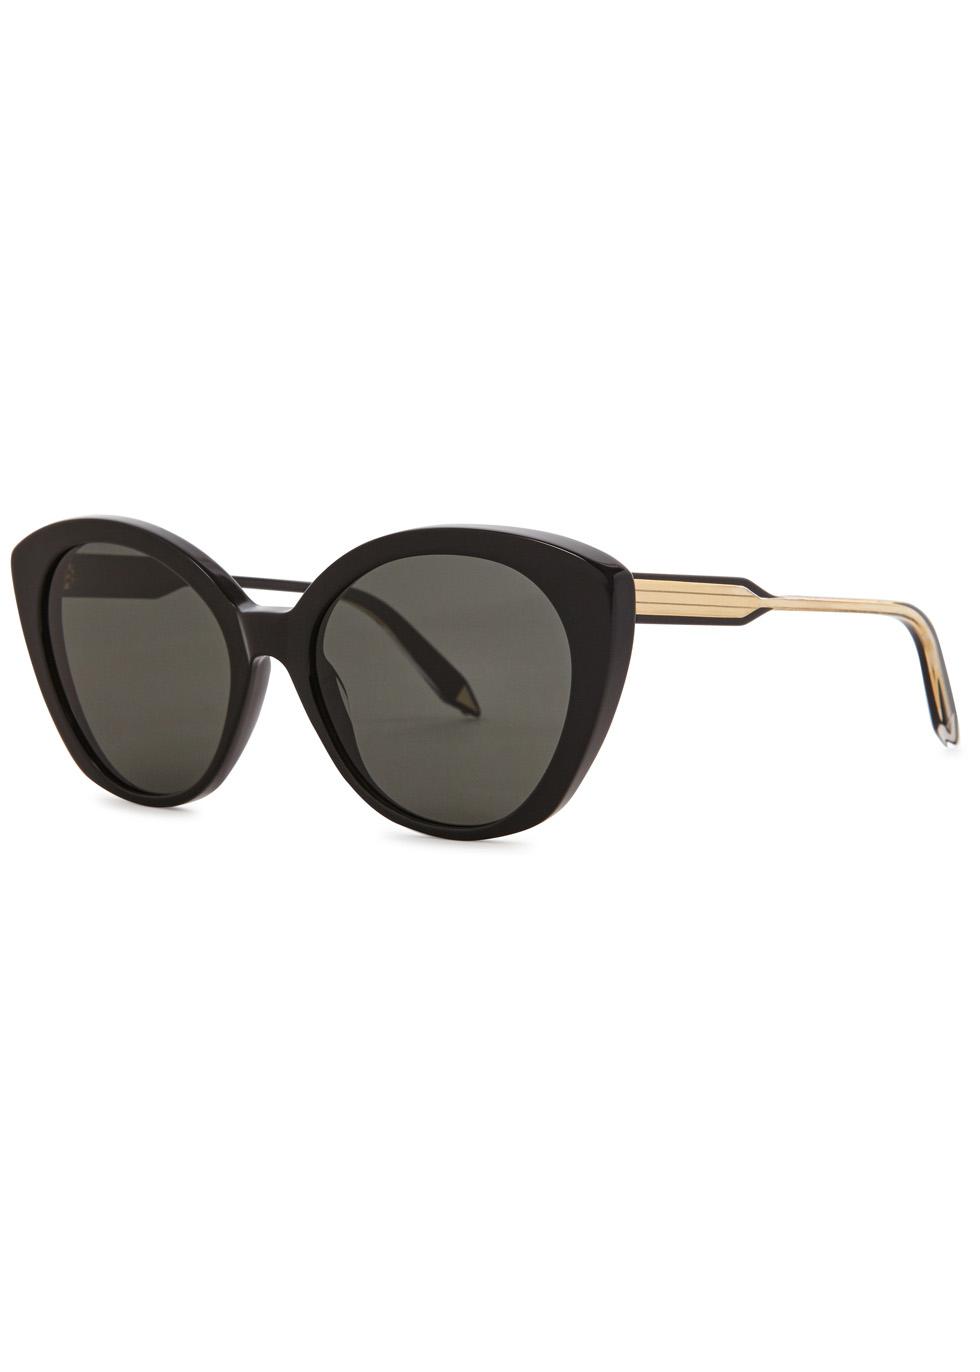 Kitten black cat-eye sunglasses - Victoria Beckham